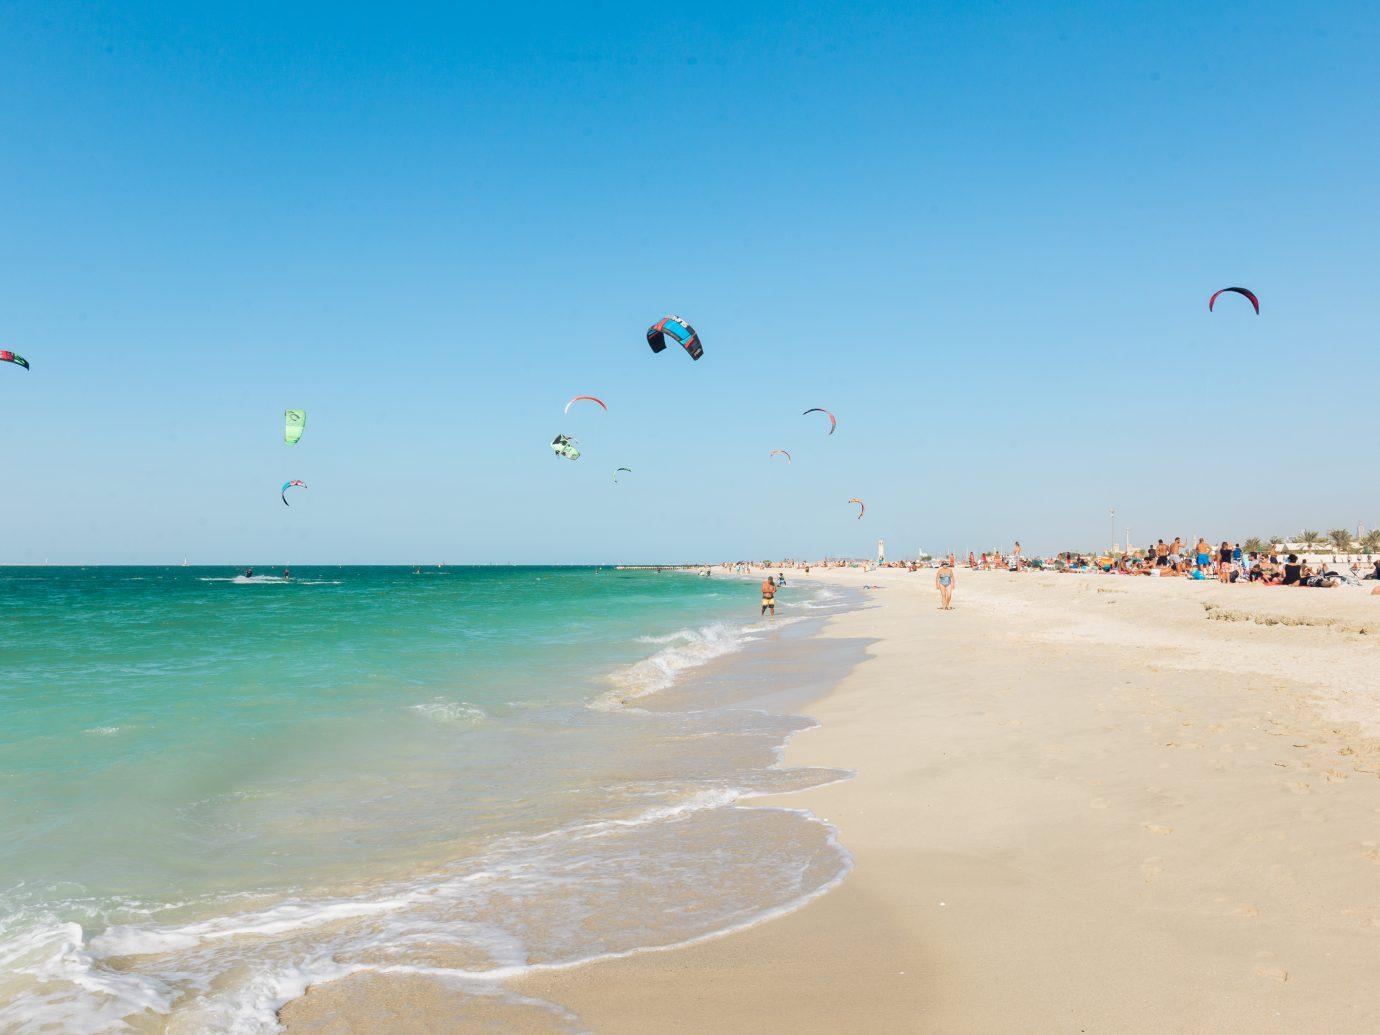 Kiteboarding at Kite Beach in Dubai 2015